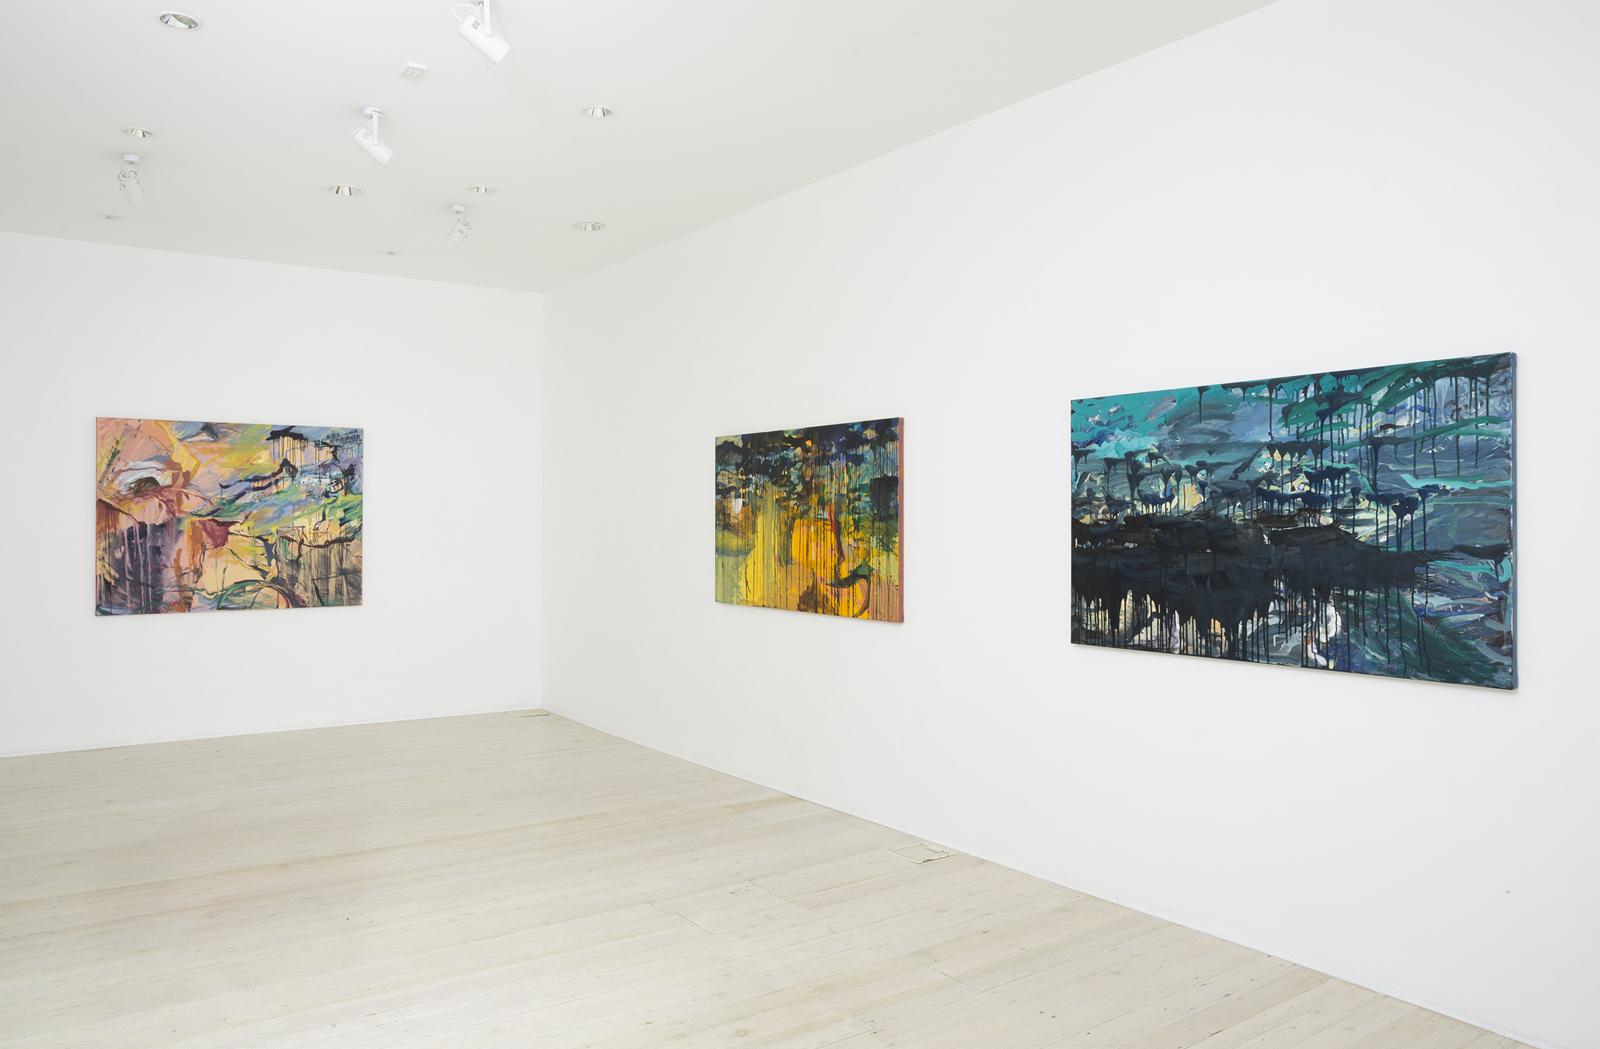 Michael Taylor, Artist, Gallery 9